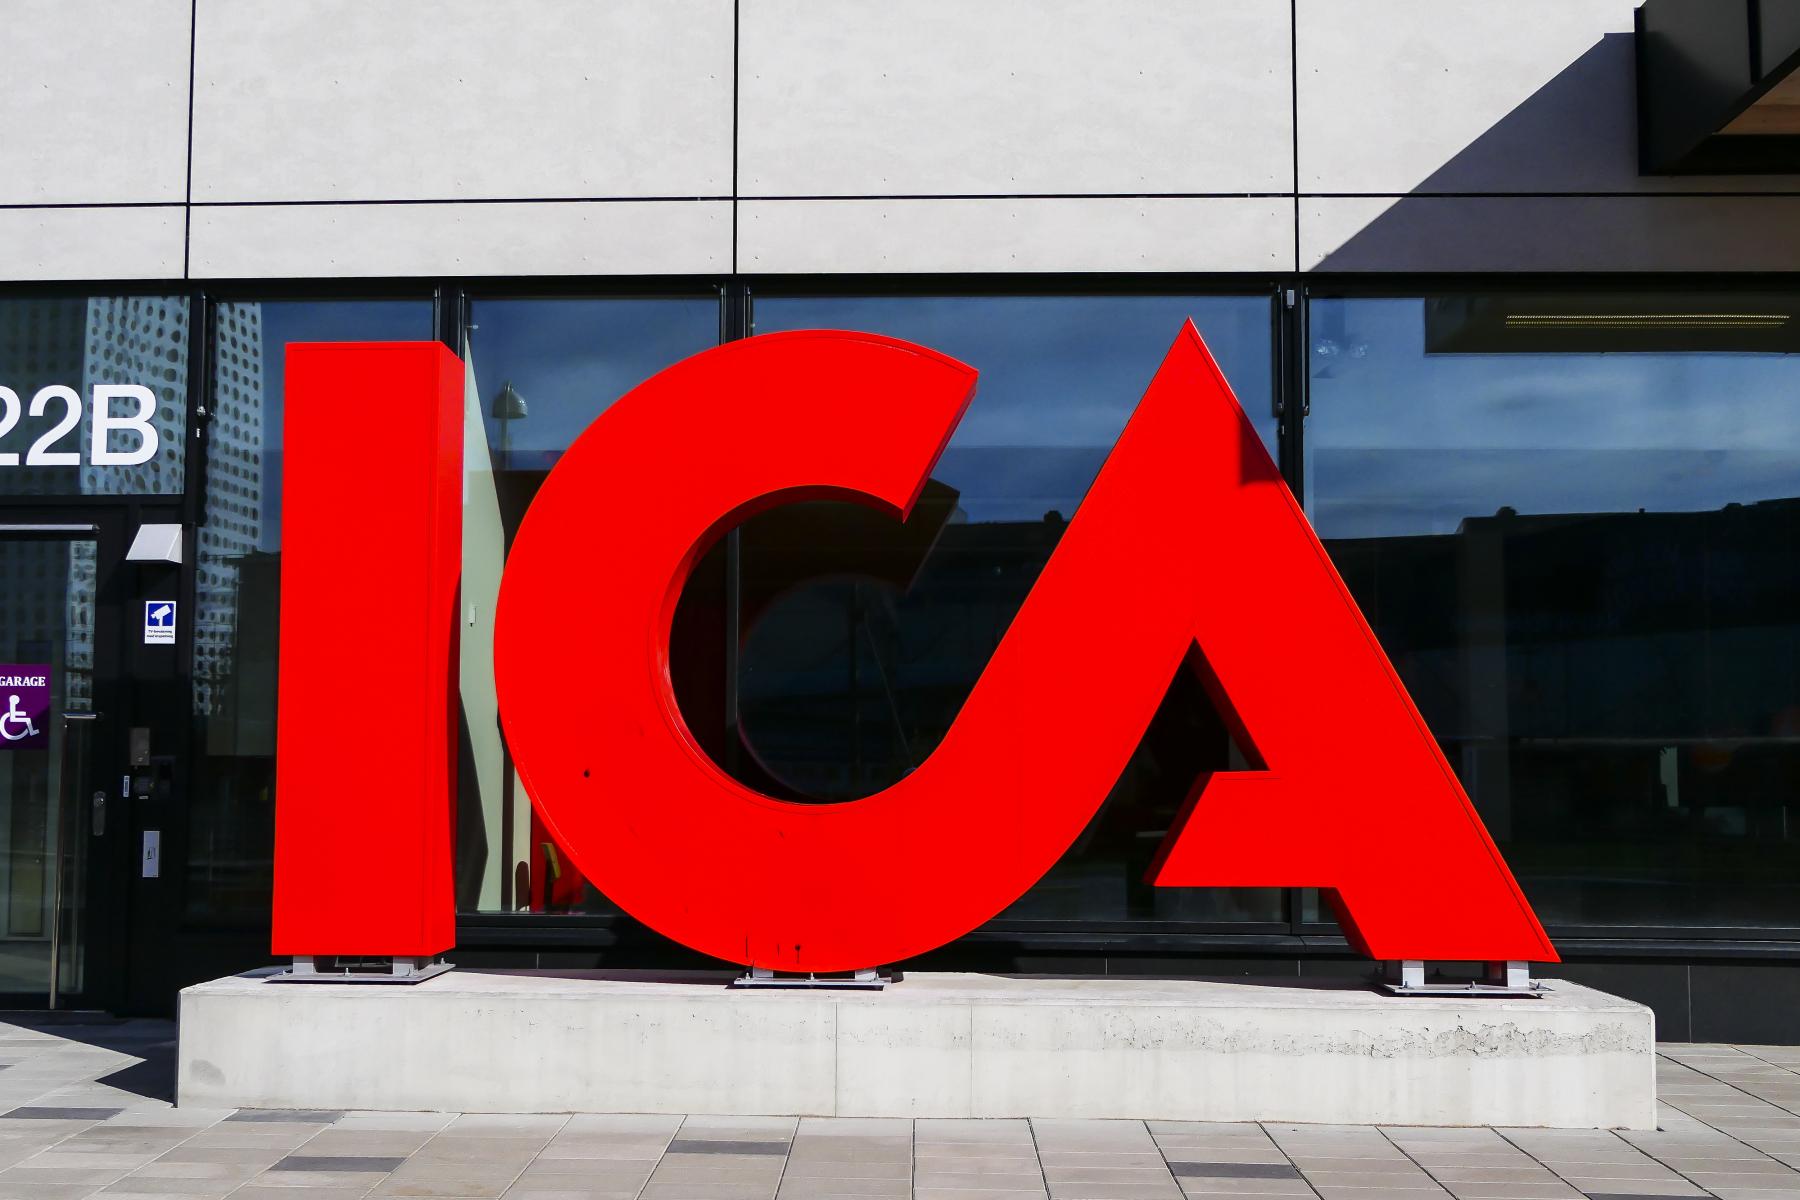 1,4 procent plus för Ica under juni